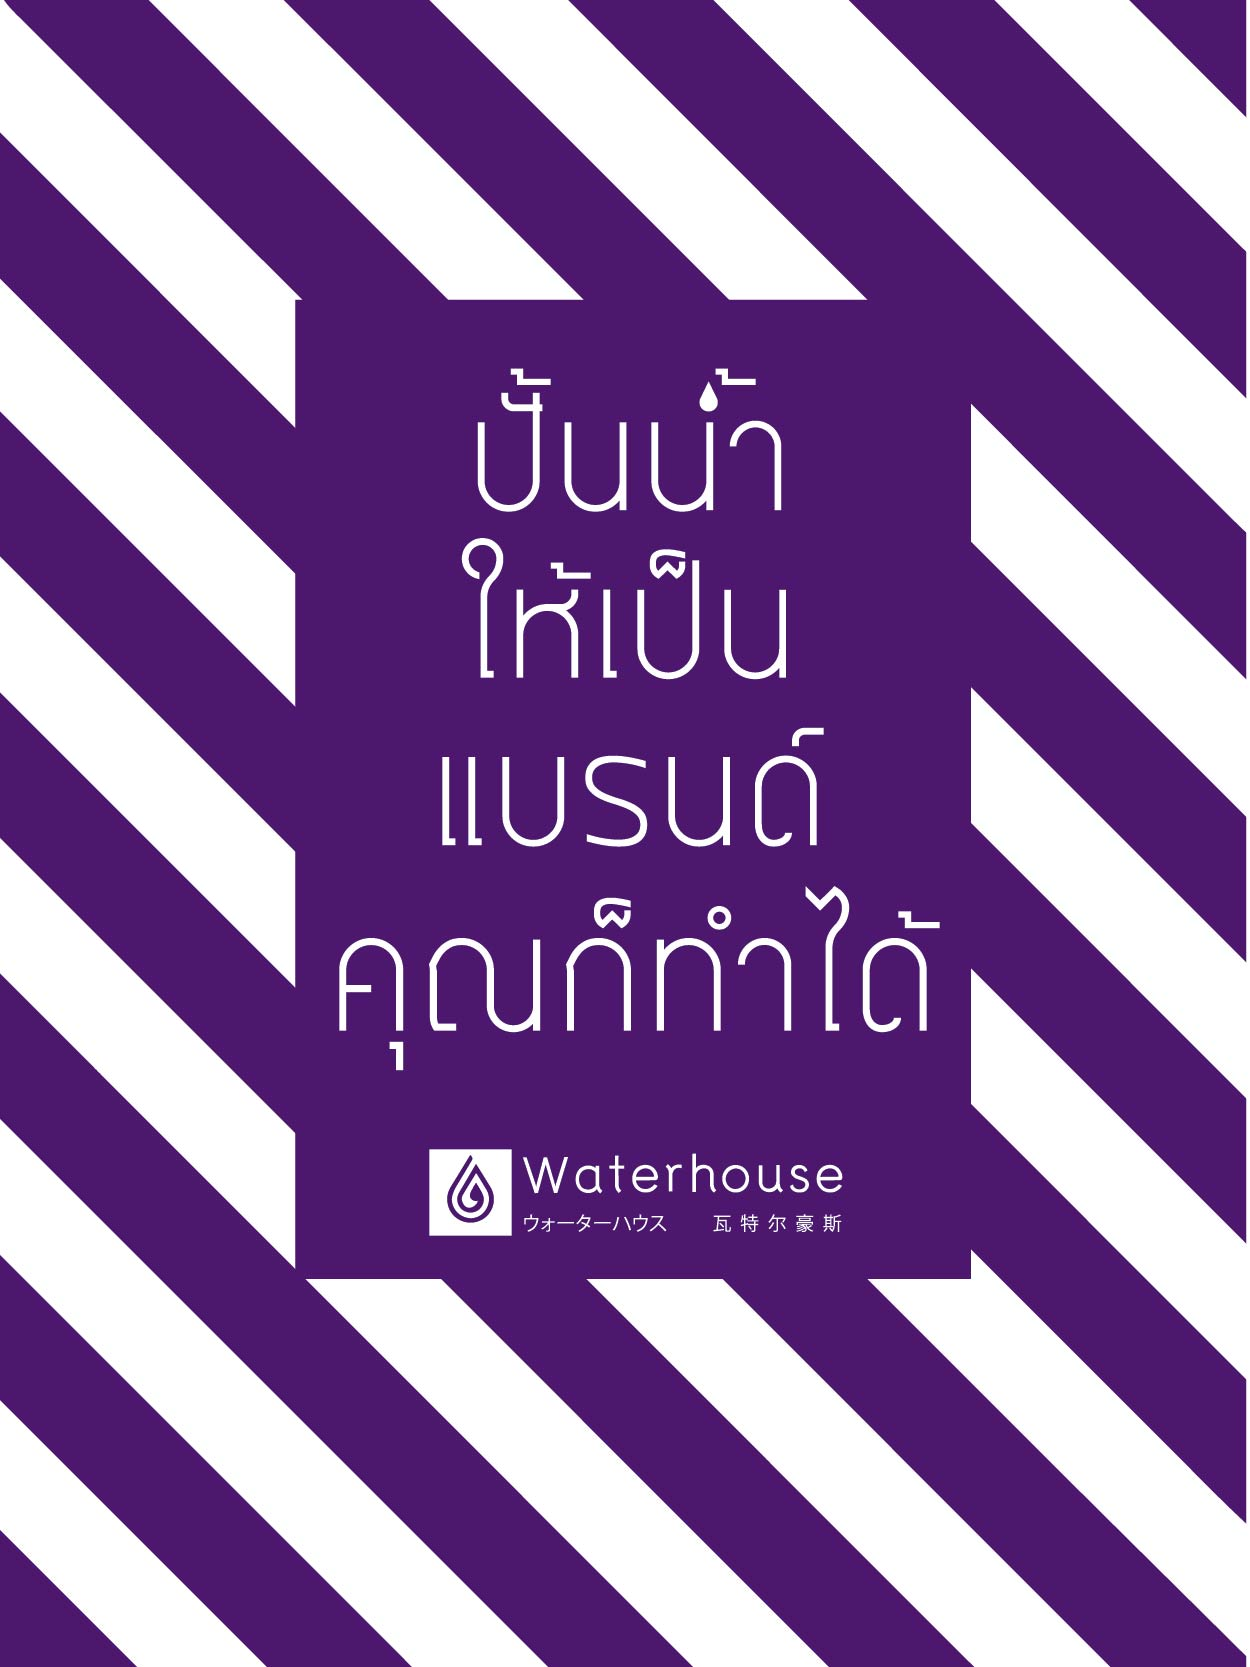 waterhouse-ปั้นน้ำให้เป็นแบรนด์